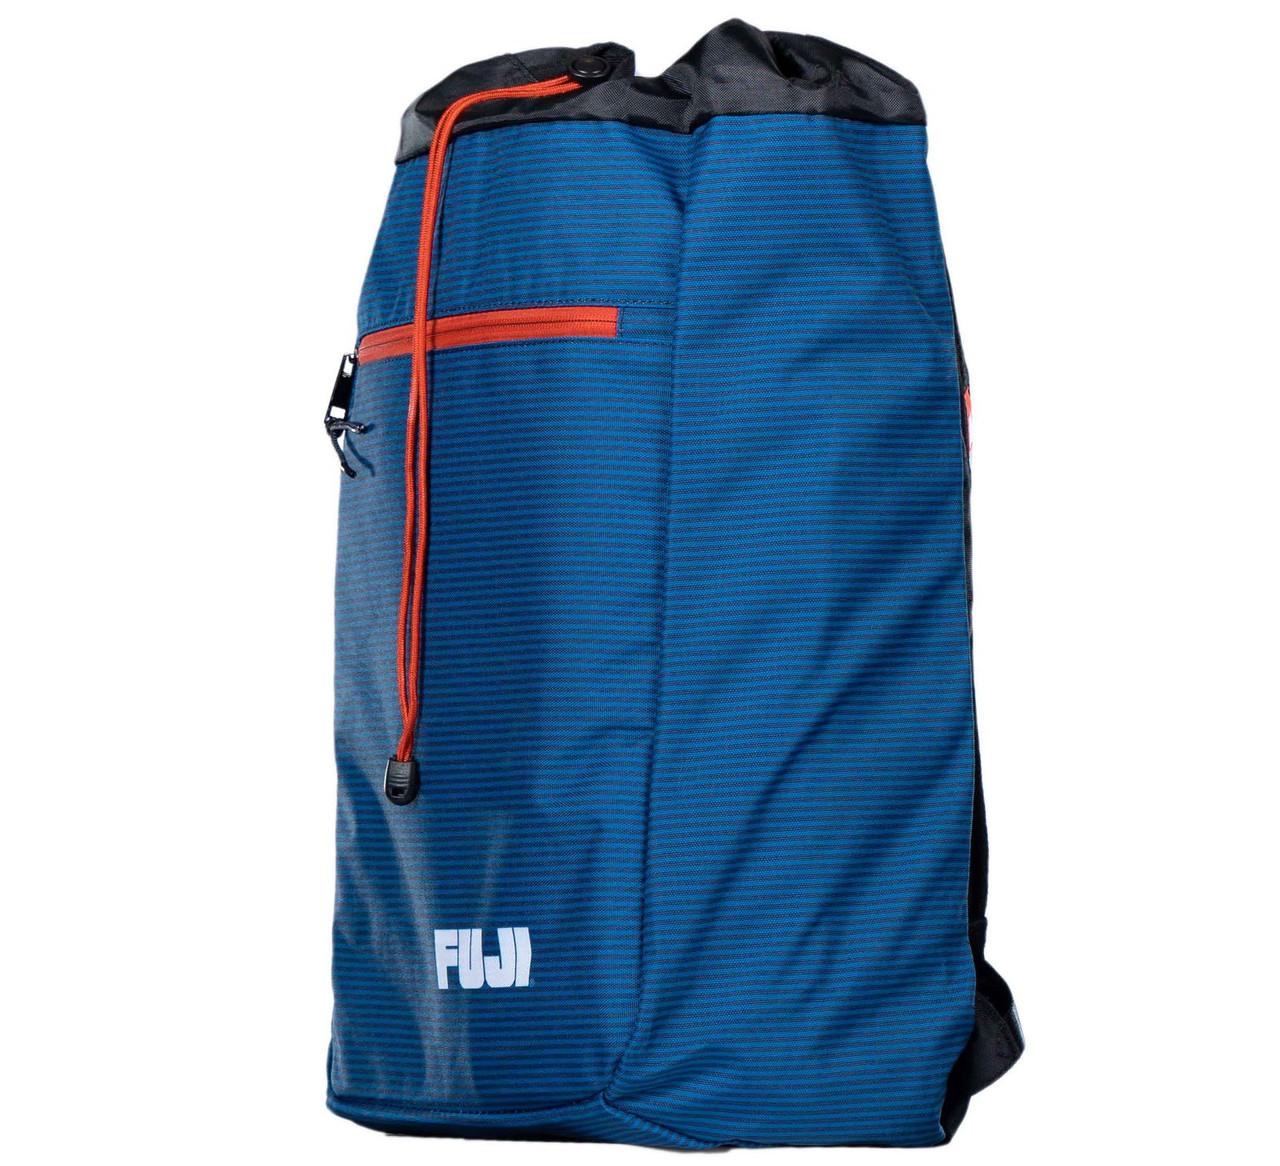 Blue White New Ringside Cinch Sack Backpack Gear Gym Equipment Carry Bag